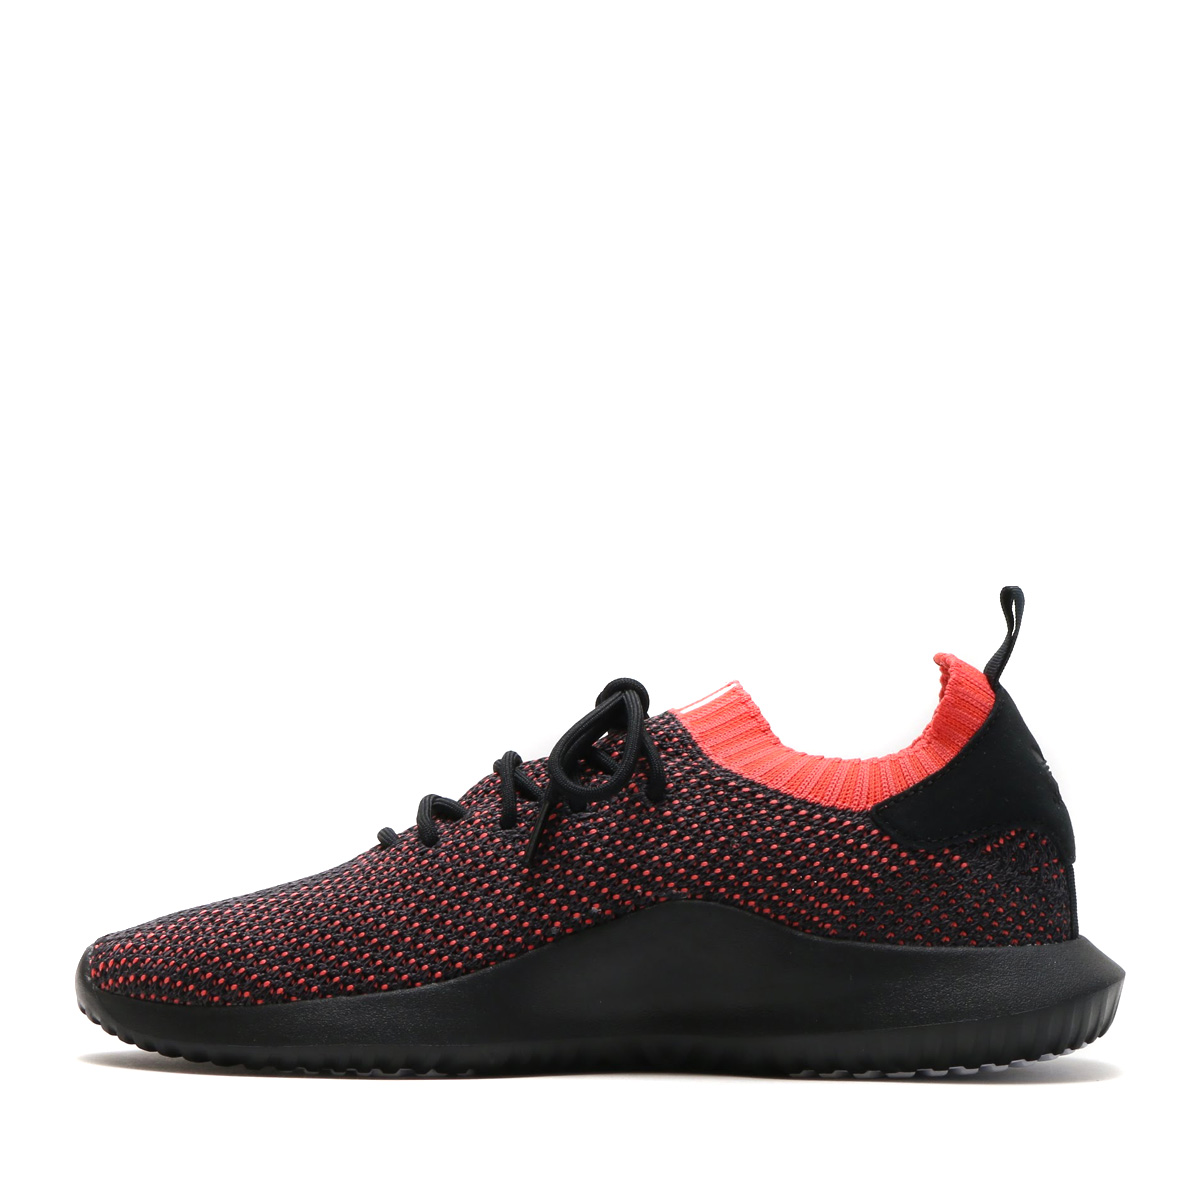 buy online 207bb fa81e adidas Originals TUBULAR SHADOW PK (アディダスオリジナルスチュブラーシャドウ PK) Core  Black/Core Black/Trace Scarlet18SP-S